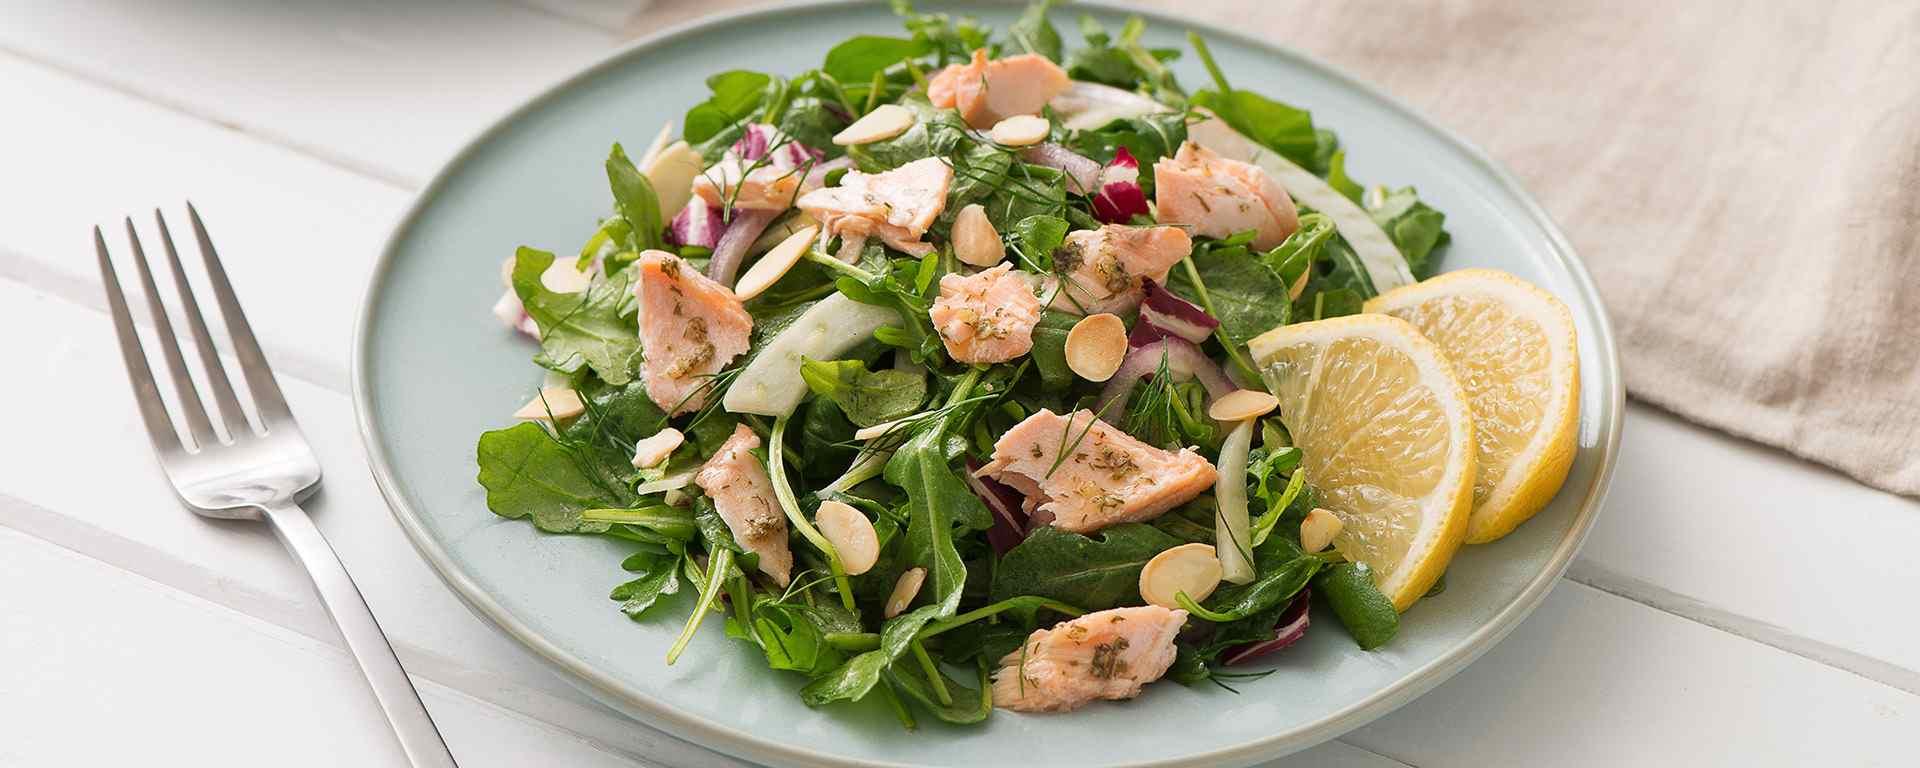 Photo for - Hot Salmon Salad with Lemon Dill and Citrus Vinaigrette